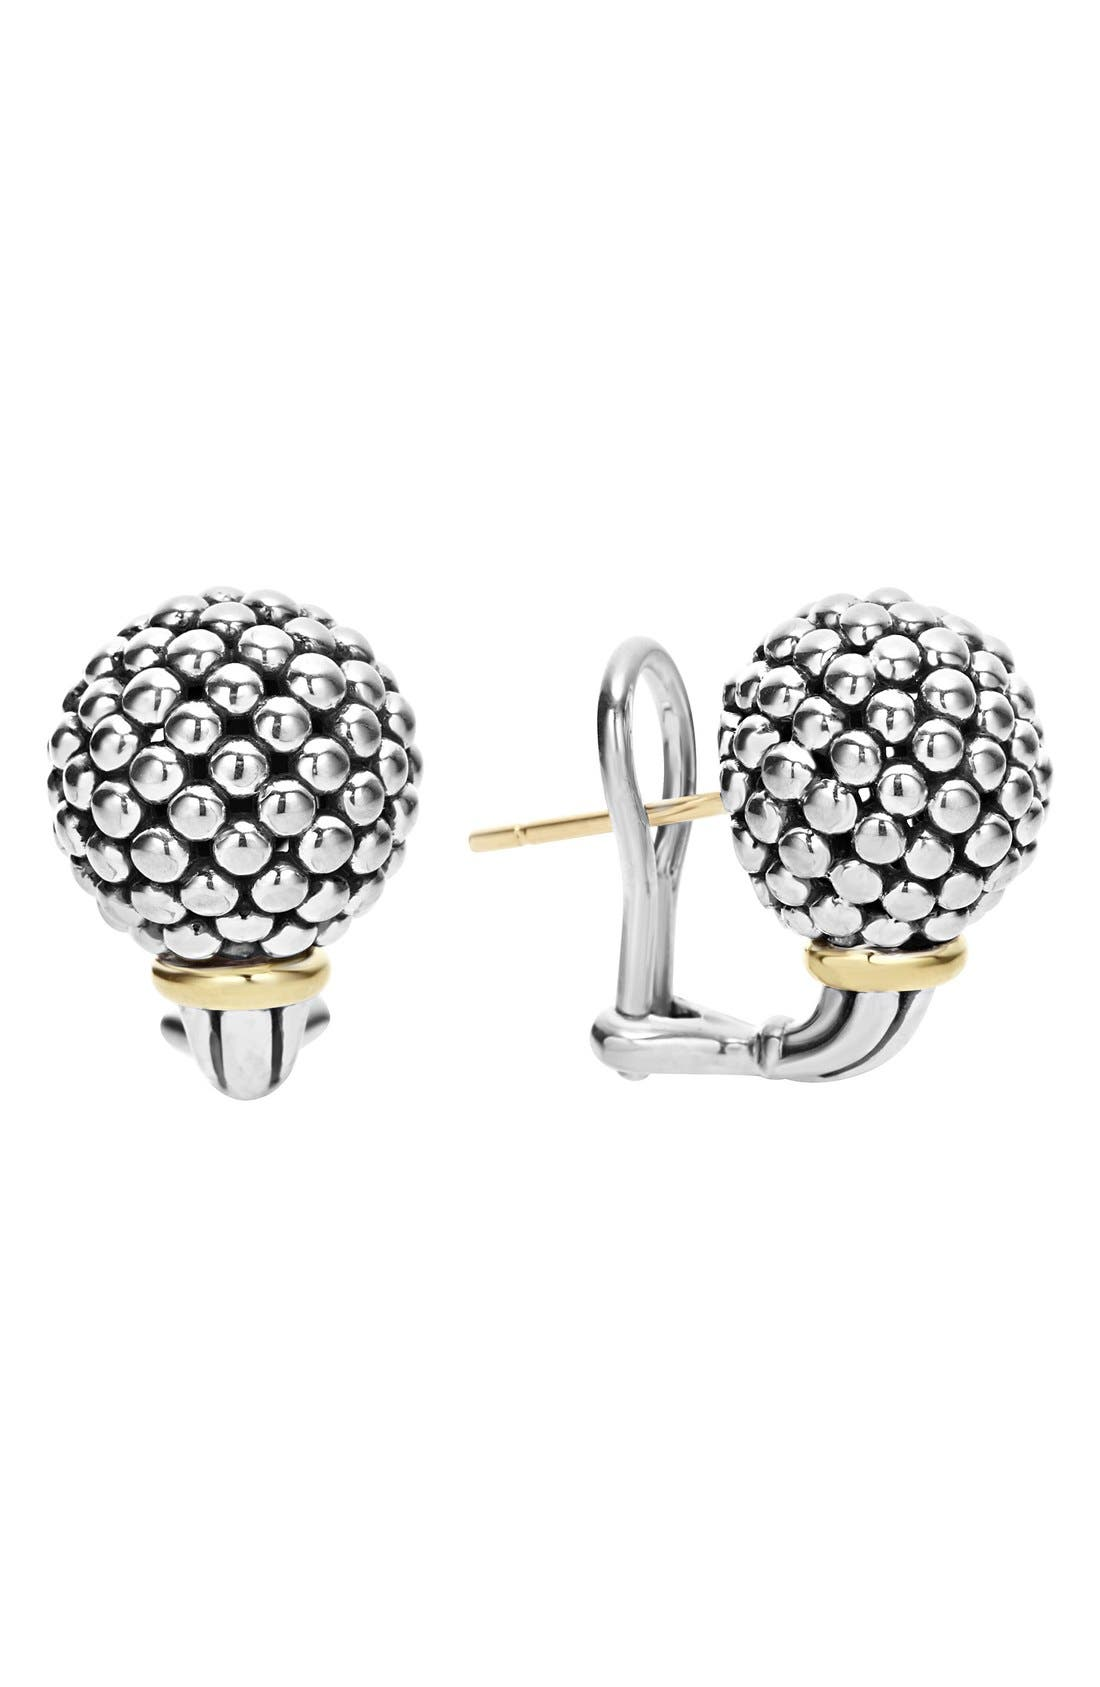 'Caviar Forever' Stud Earrings,                         Main,                         color, 040